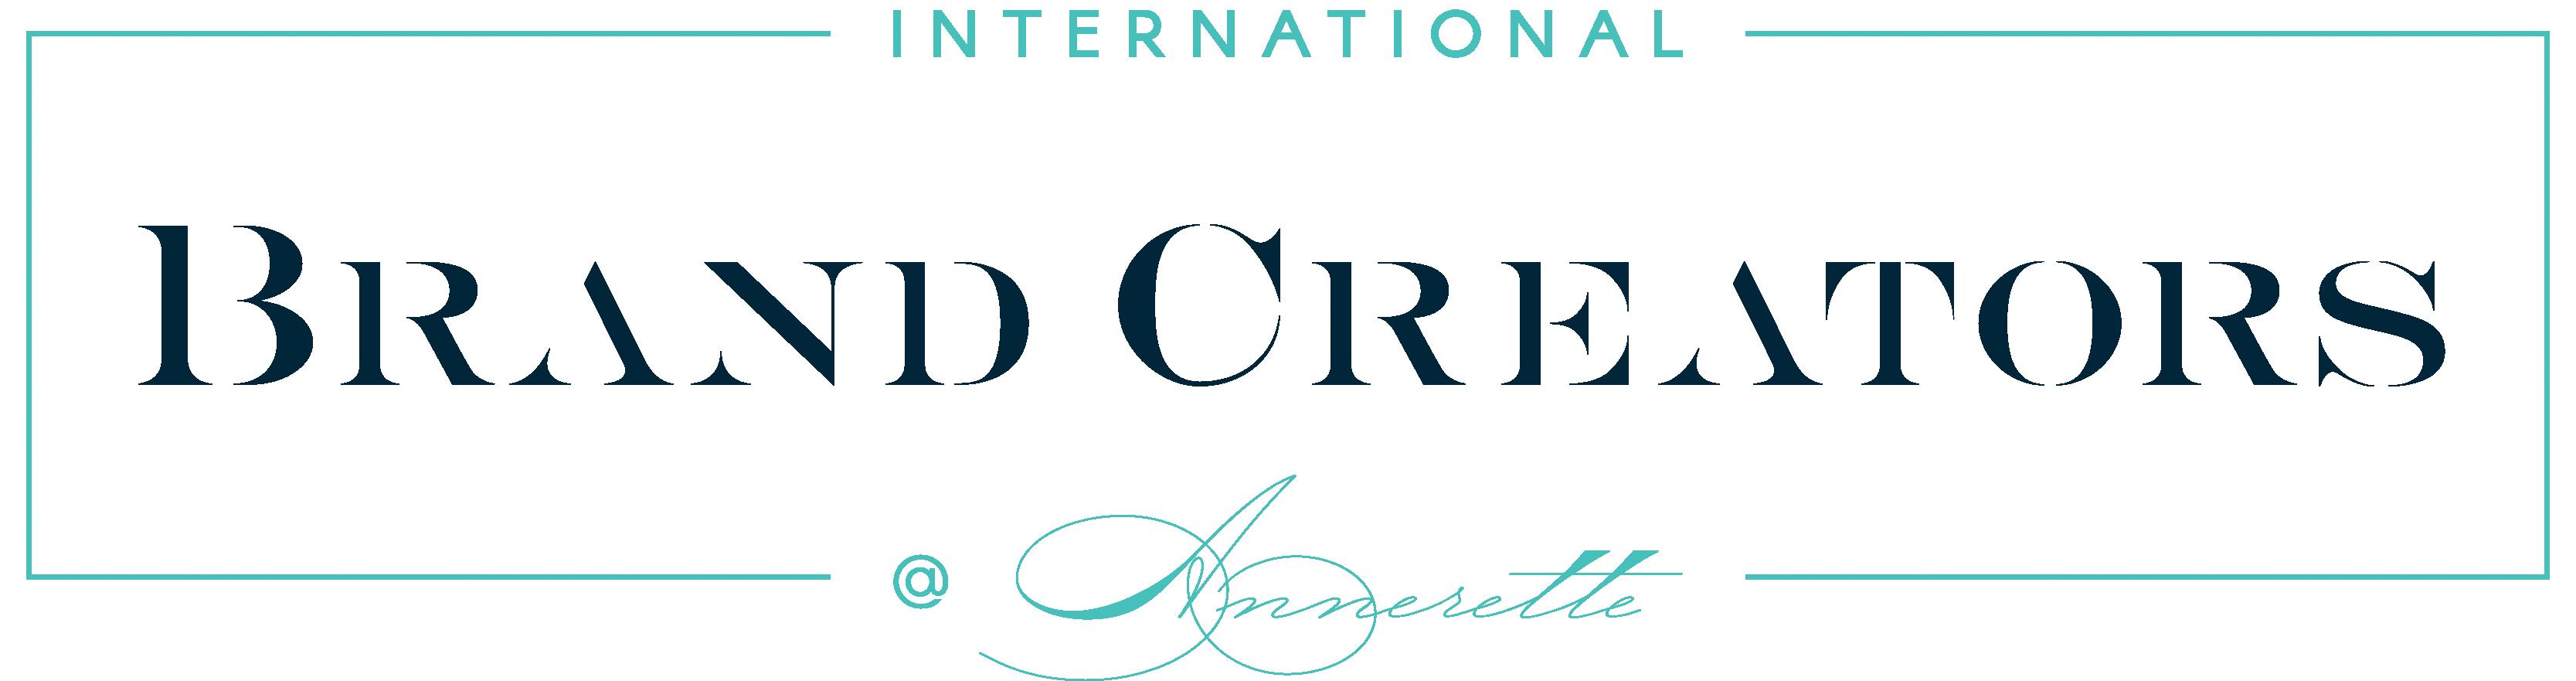 International Brand Creators